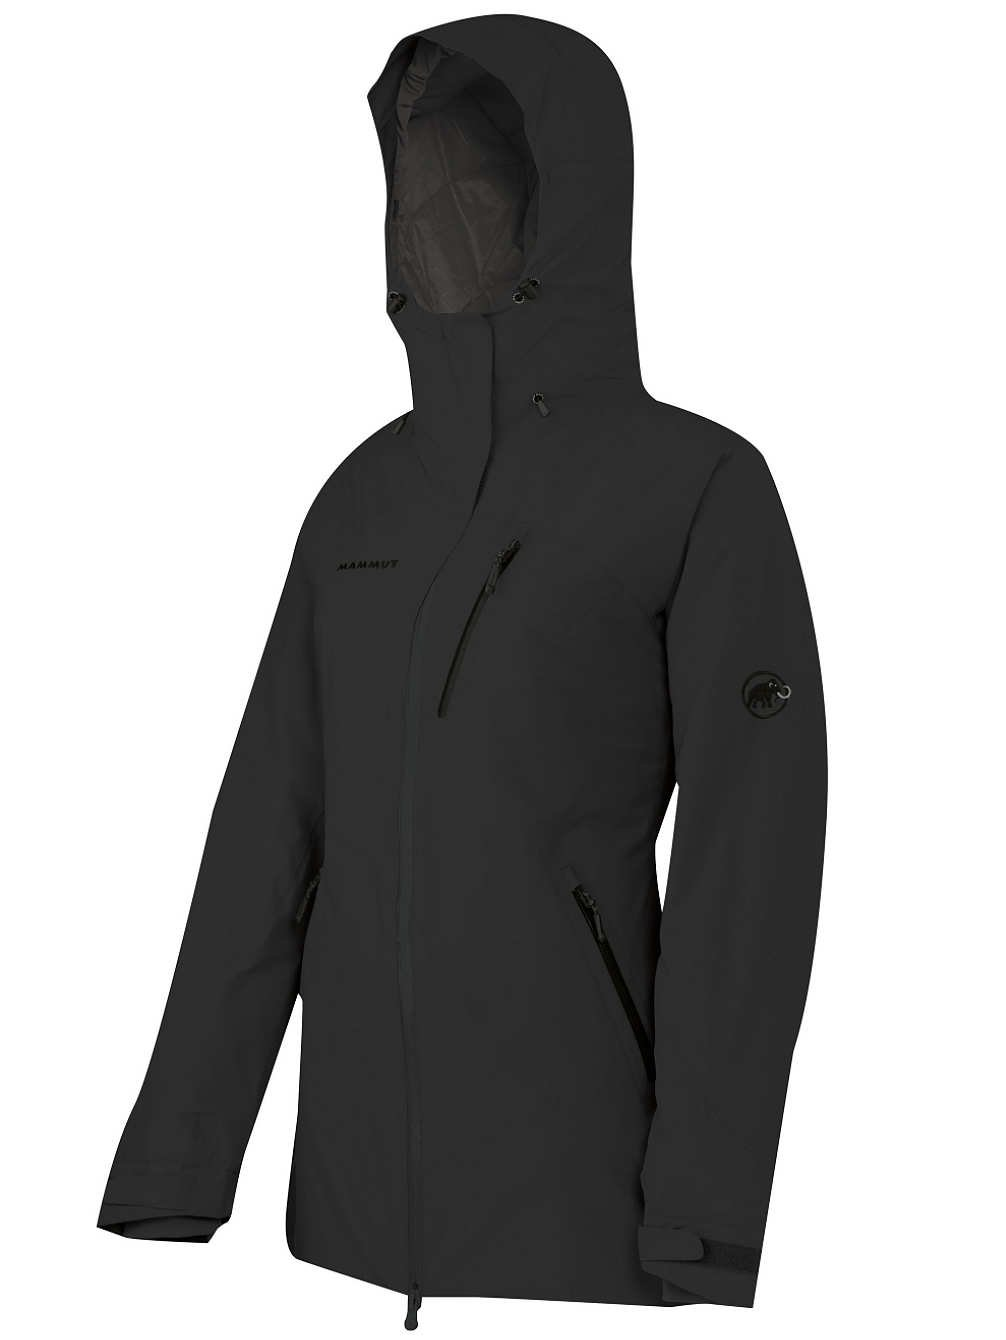 Mammut Misaun Jacket Women – Wintermantel günstig kaufen